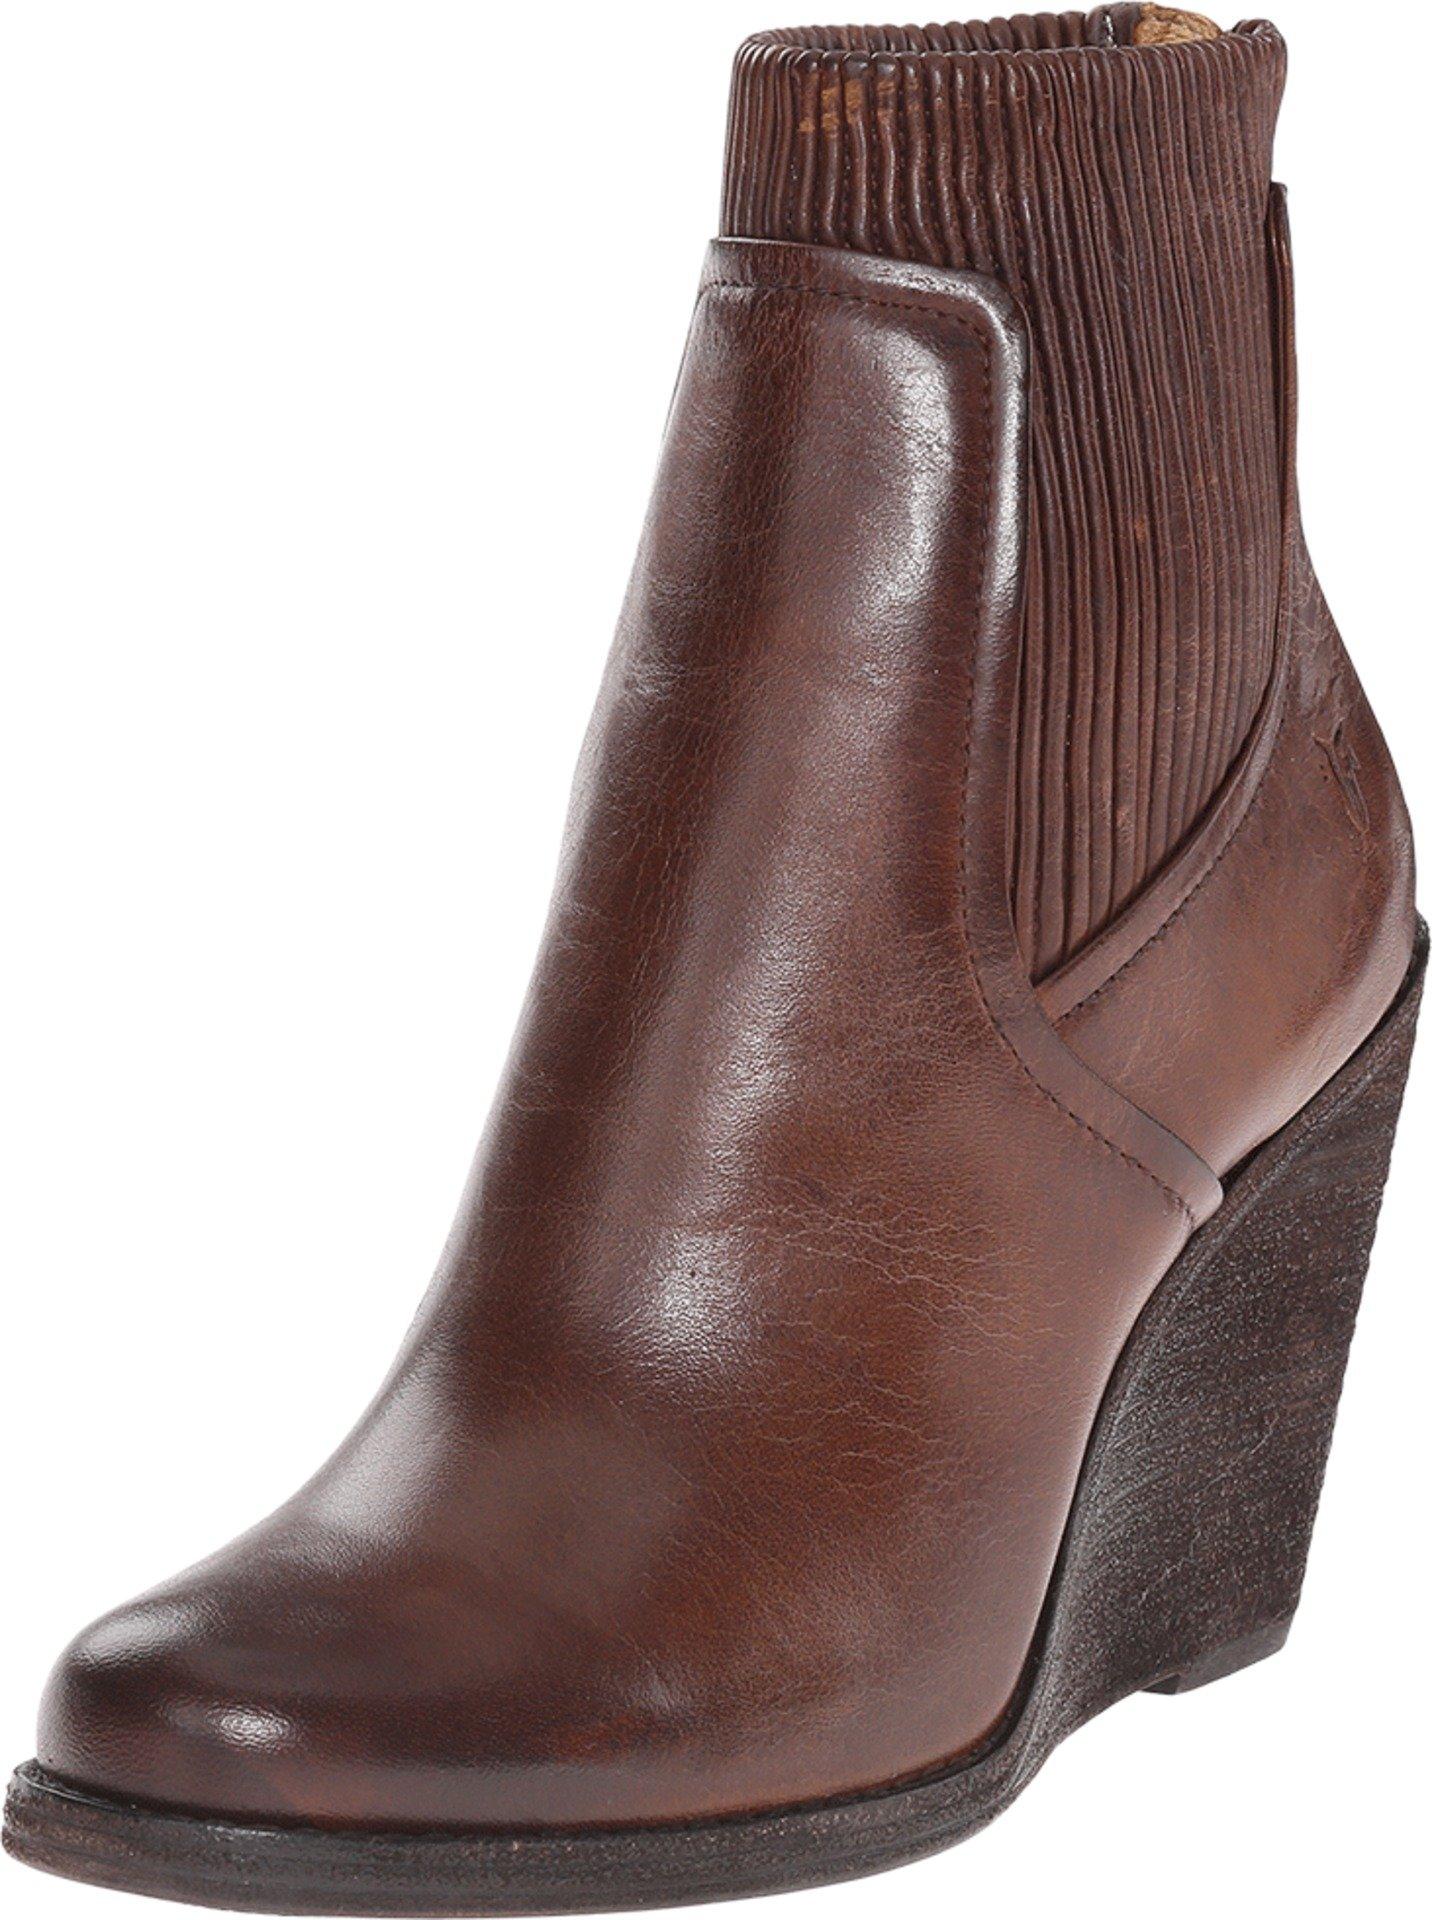 FRYE Women's Carrie Scrunch Back Zip Dark Brown Antique Pull Up Boot